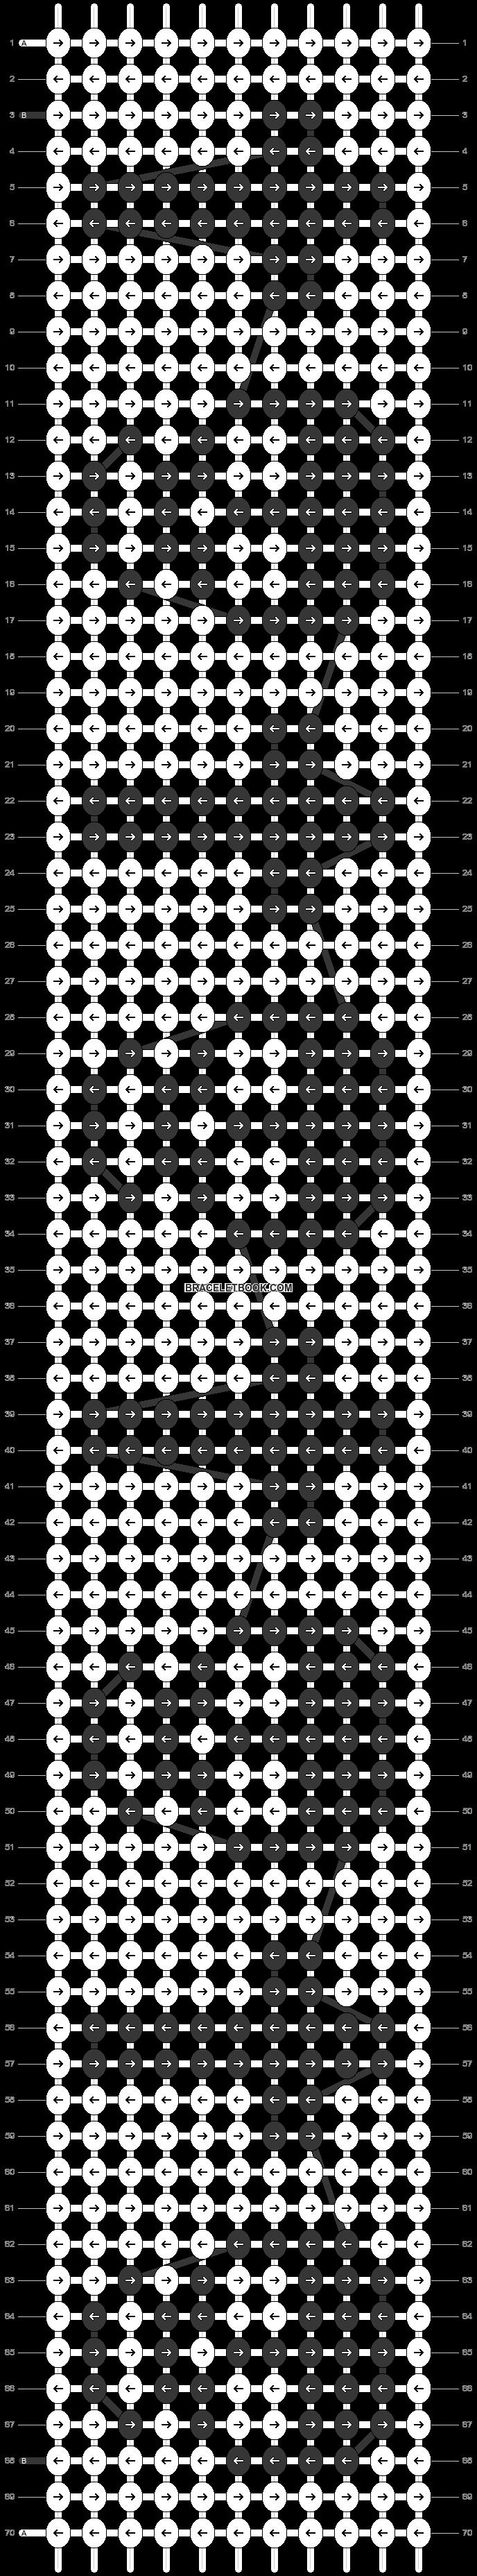 Alpha pattern #11841 pattern